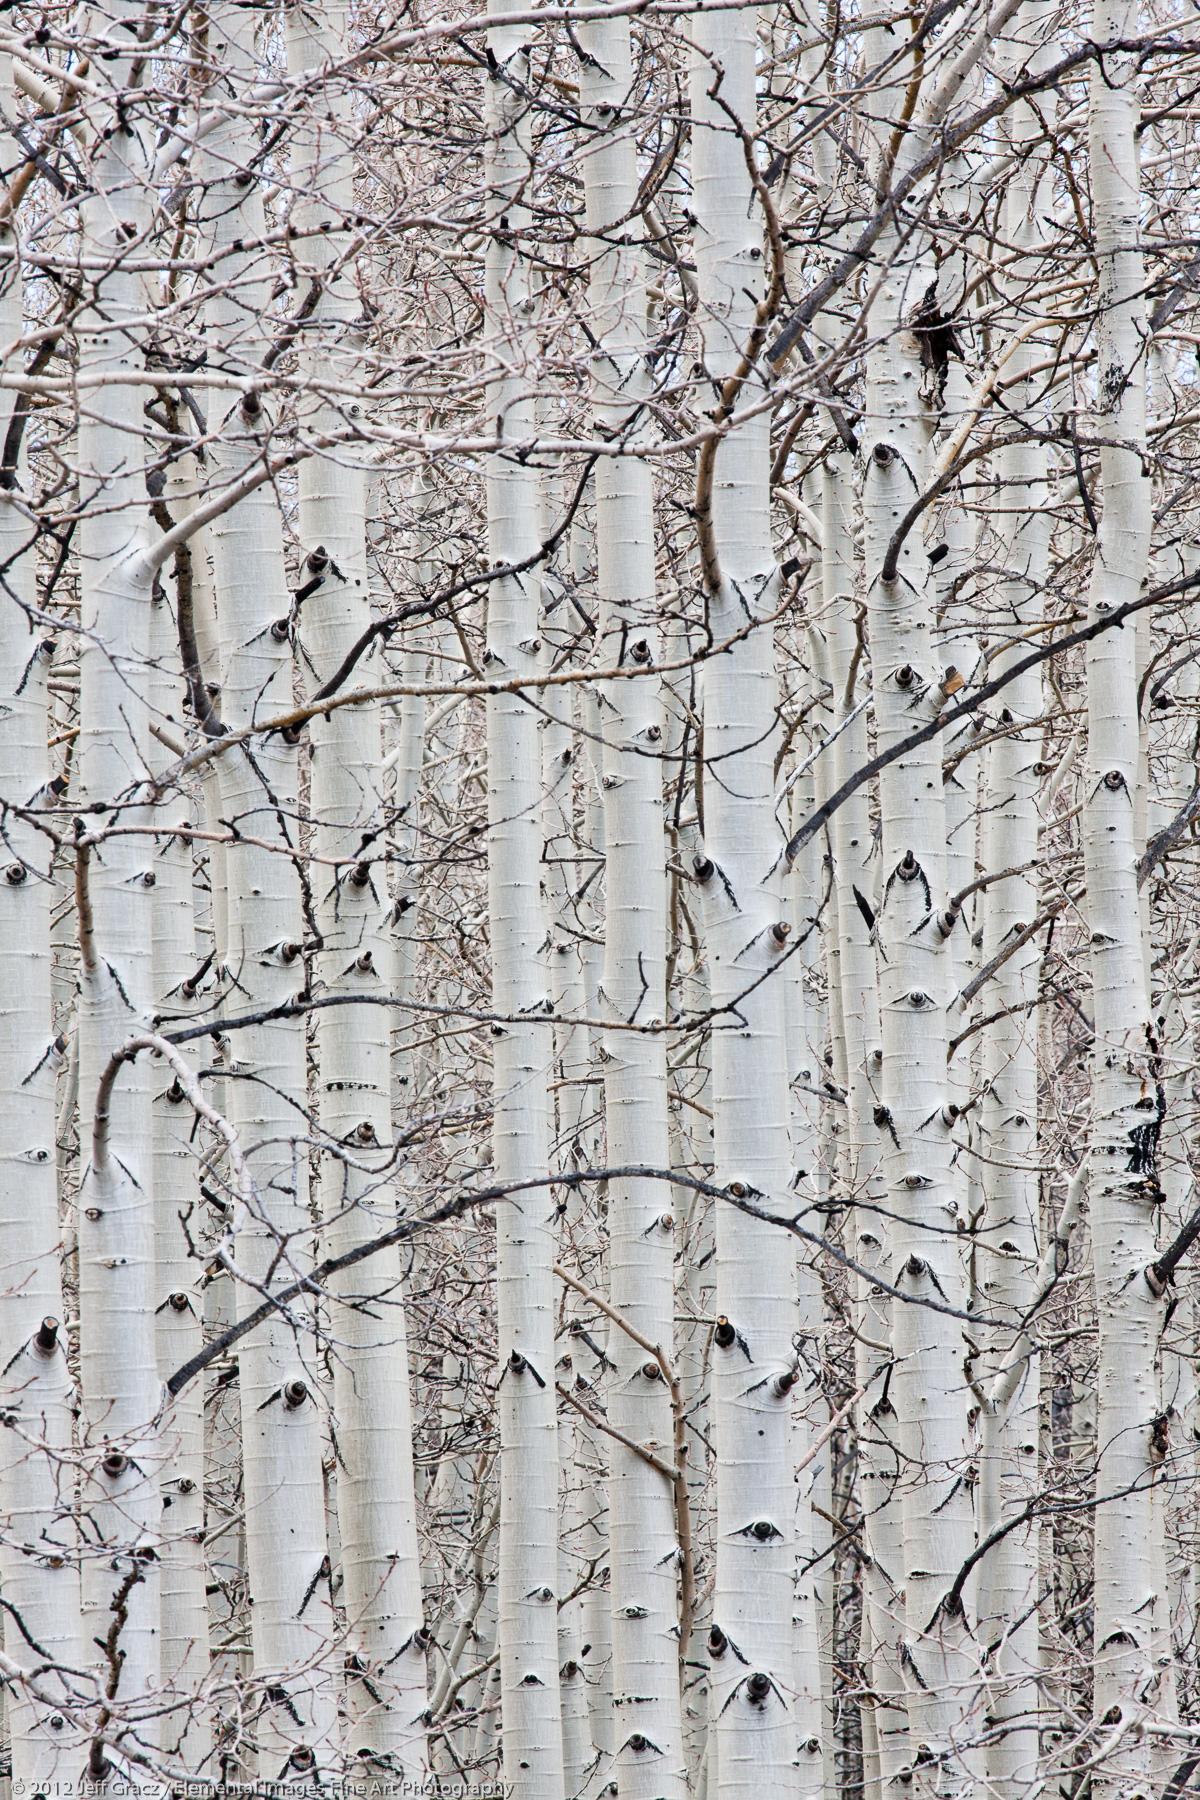 Aspens Trunks | Boulder Mountain | UT | USA - © © 2012 Jeff Gracz / Elemental Images Fine Art Photography - All Rights Reserved Worldwide